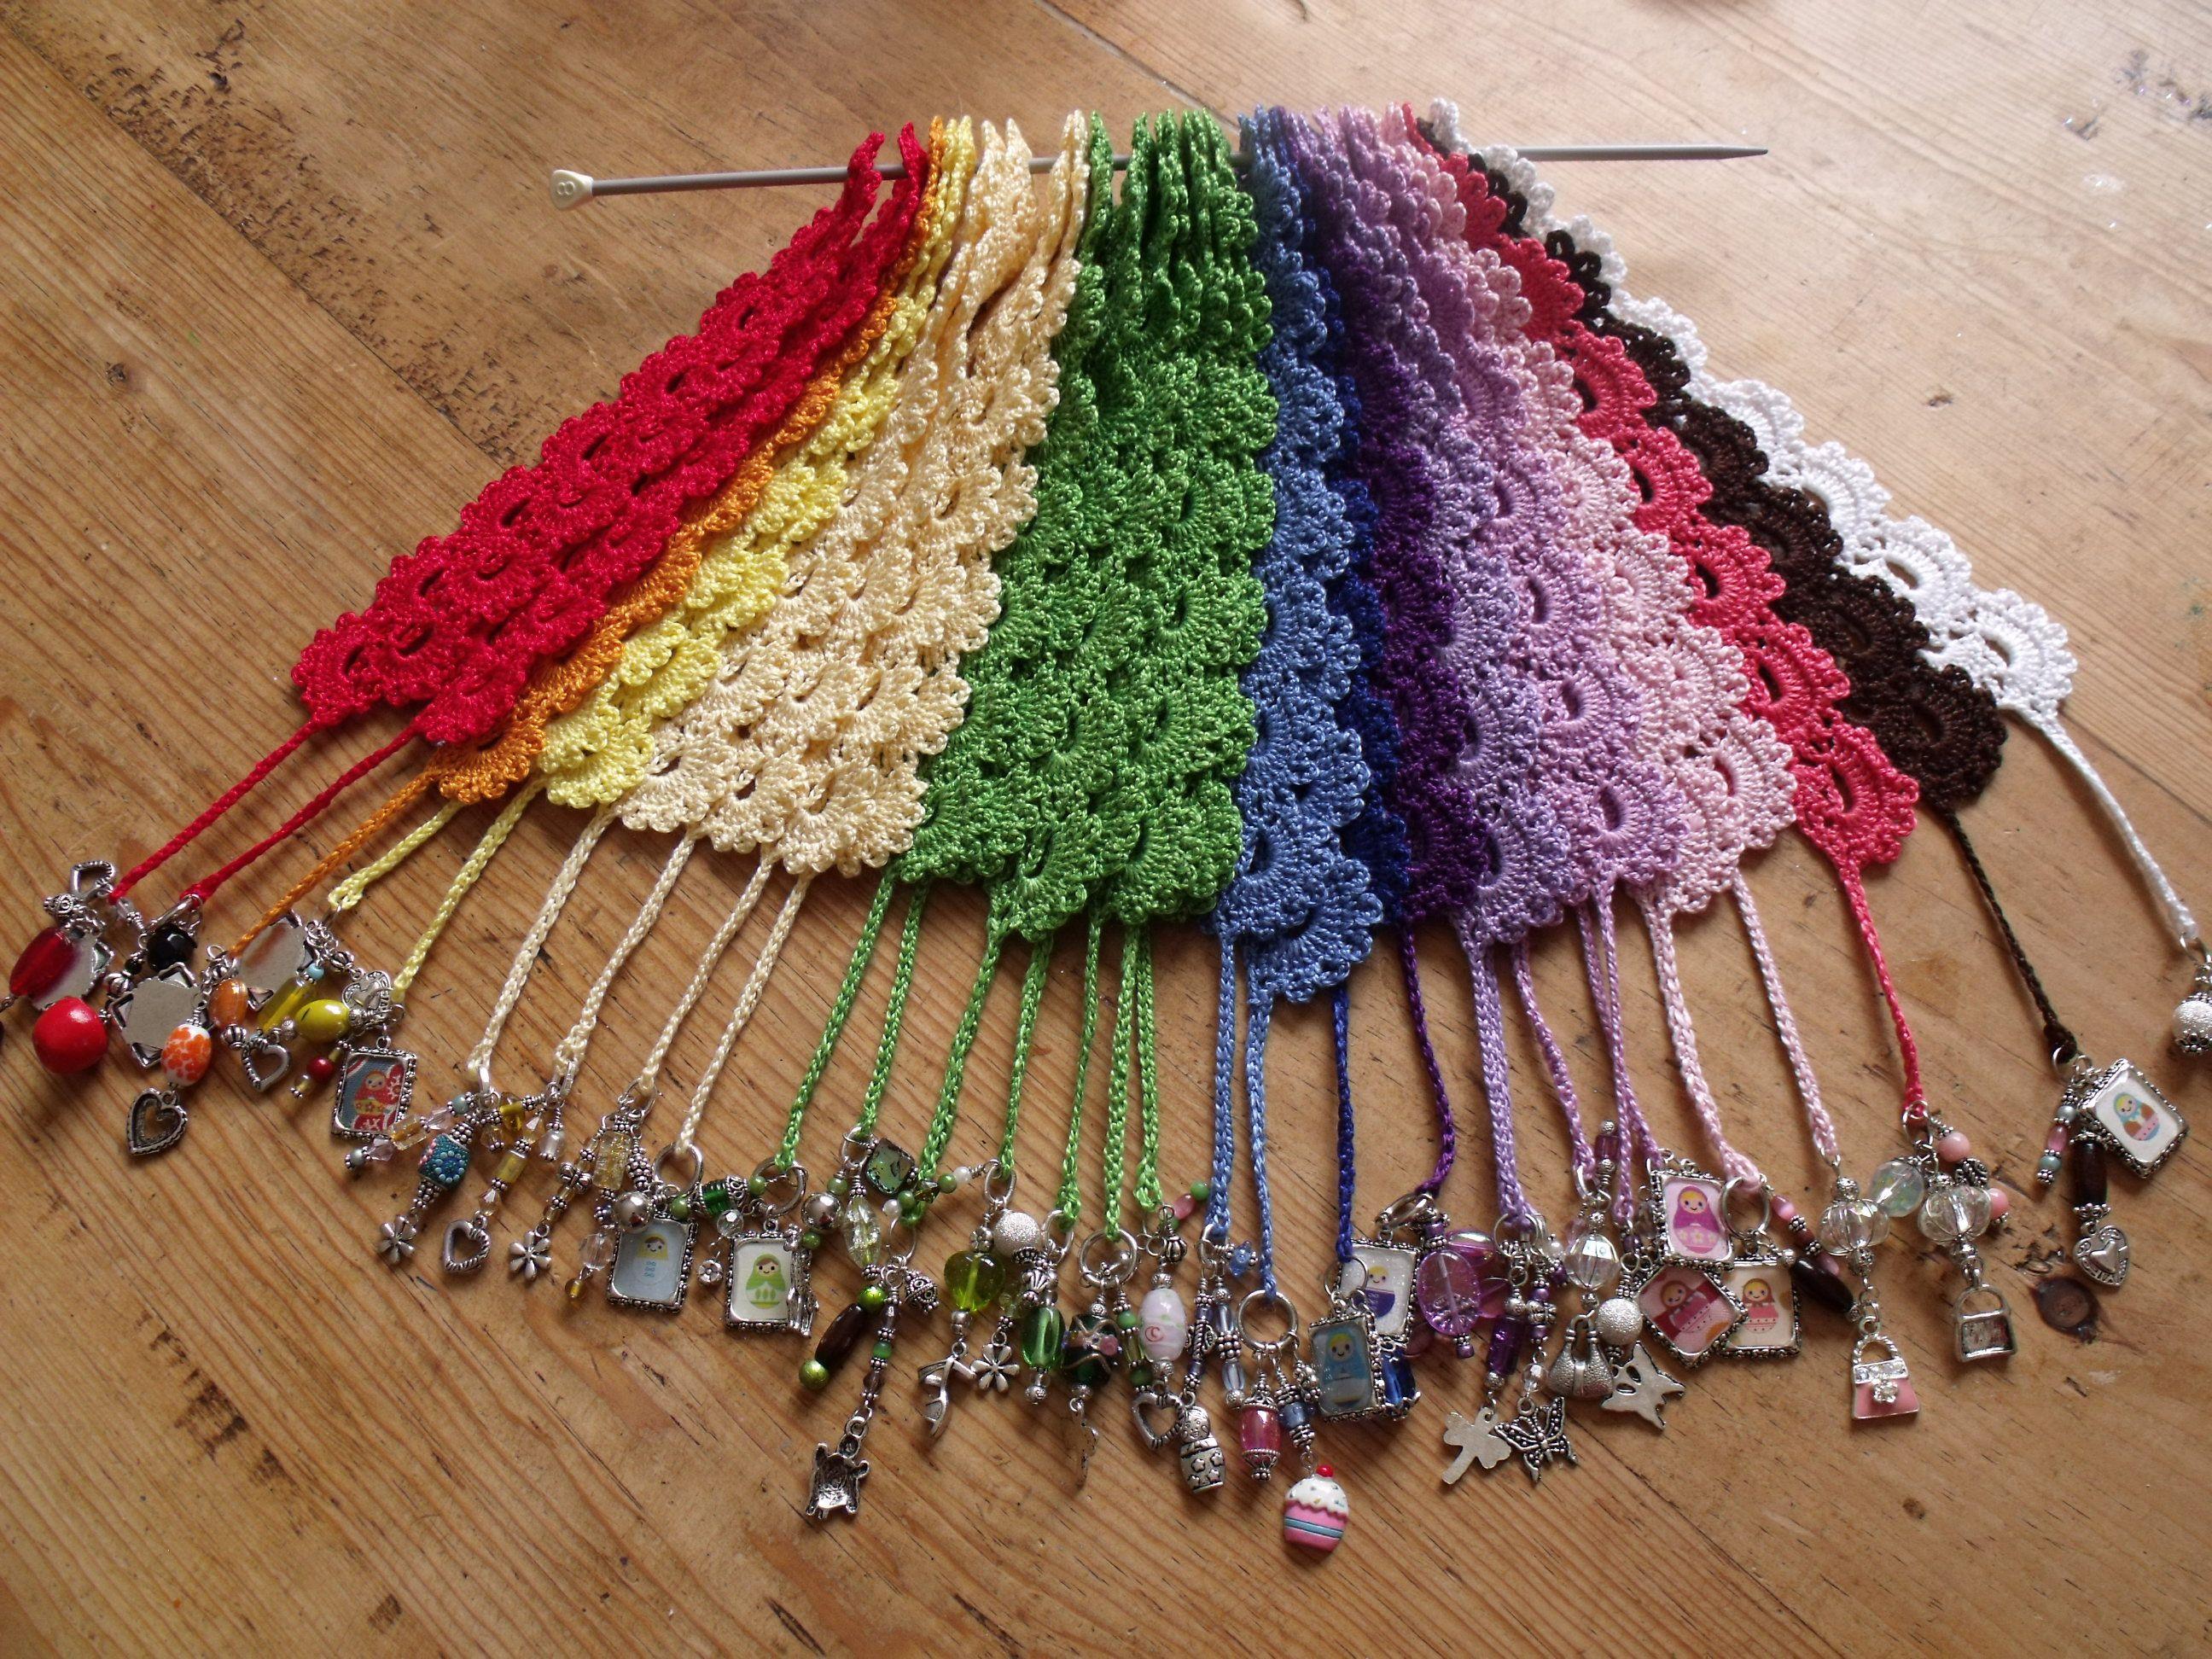 Best 25 crochet craft fair ideas on pinterest craft for Best sellers at craft fairs 2016